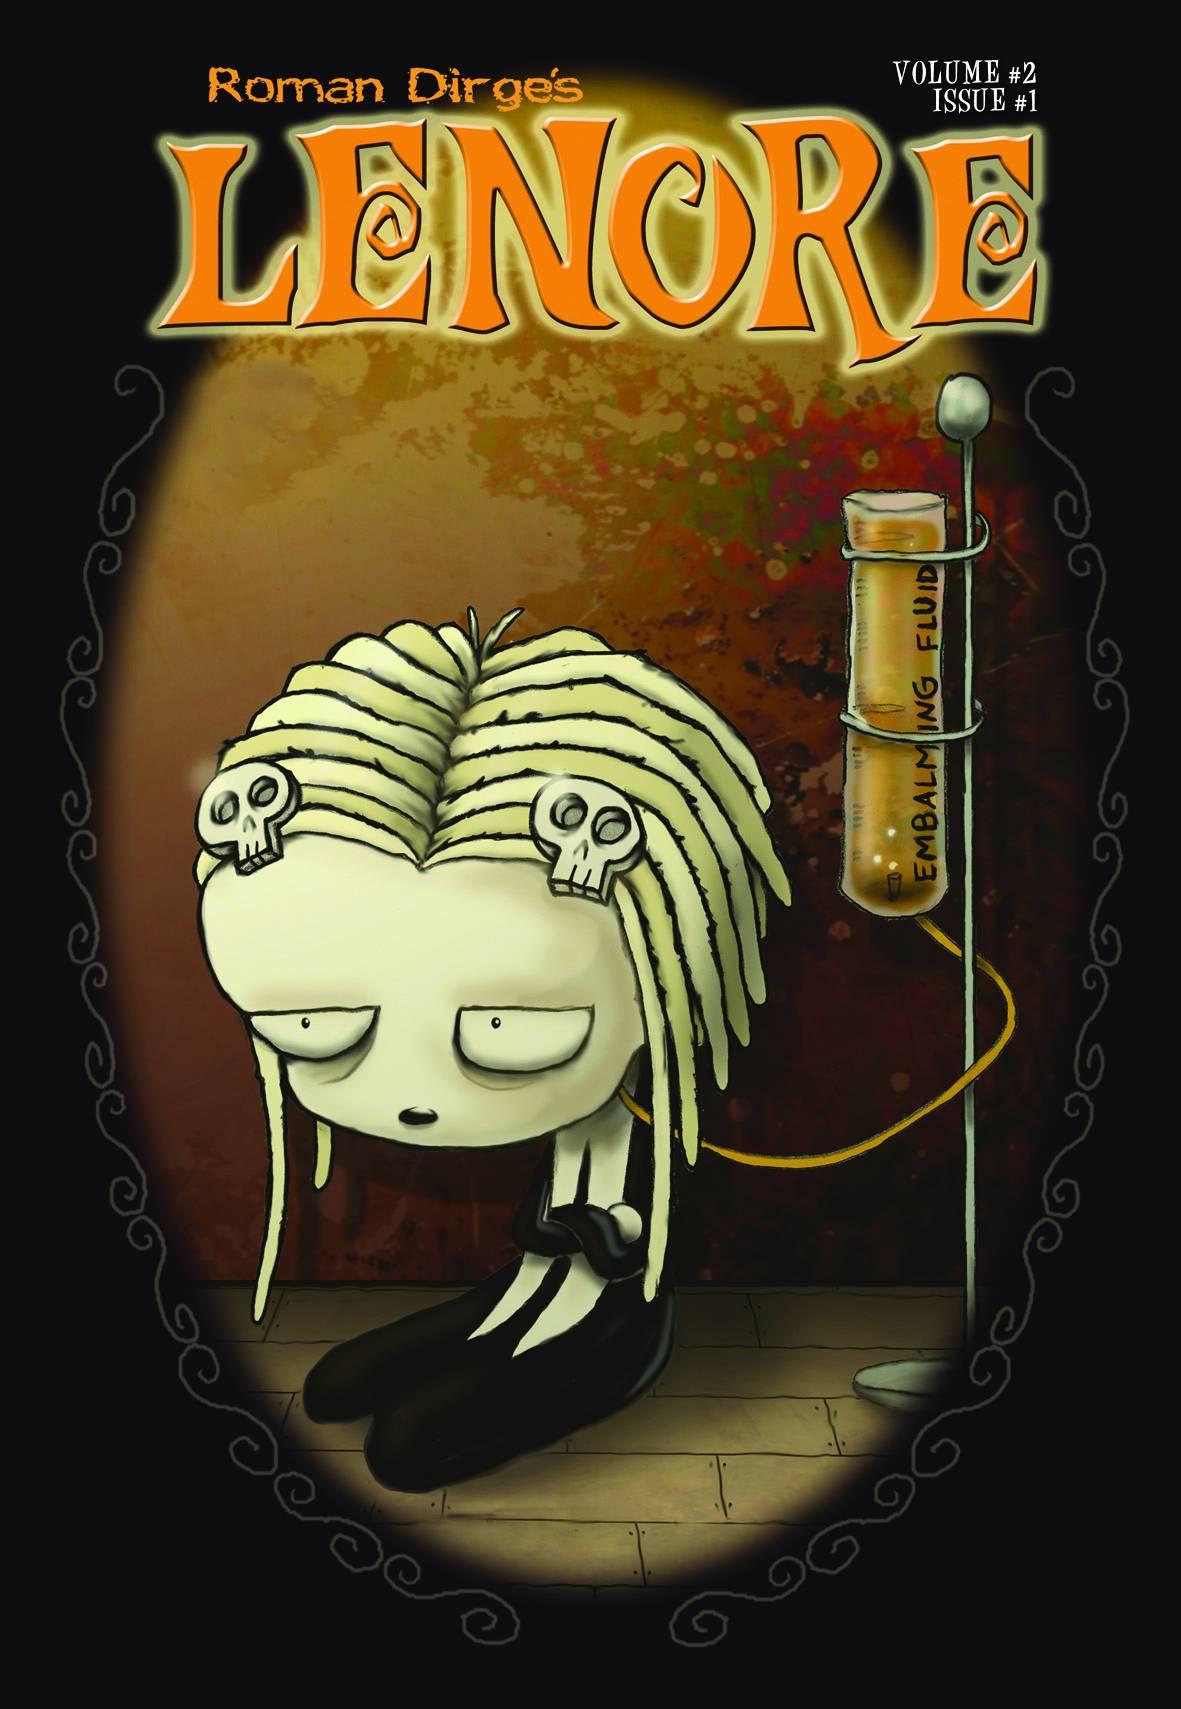 LENORE VOL II I